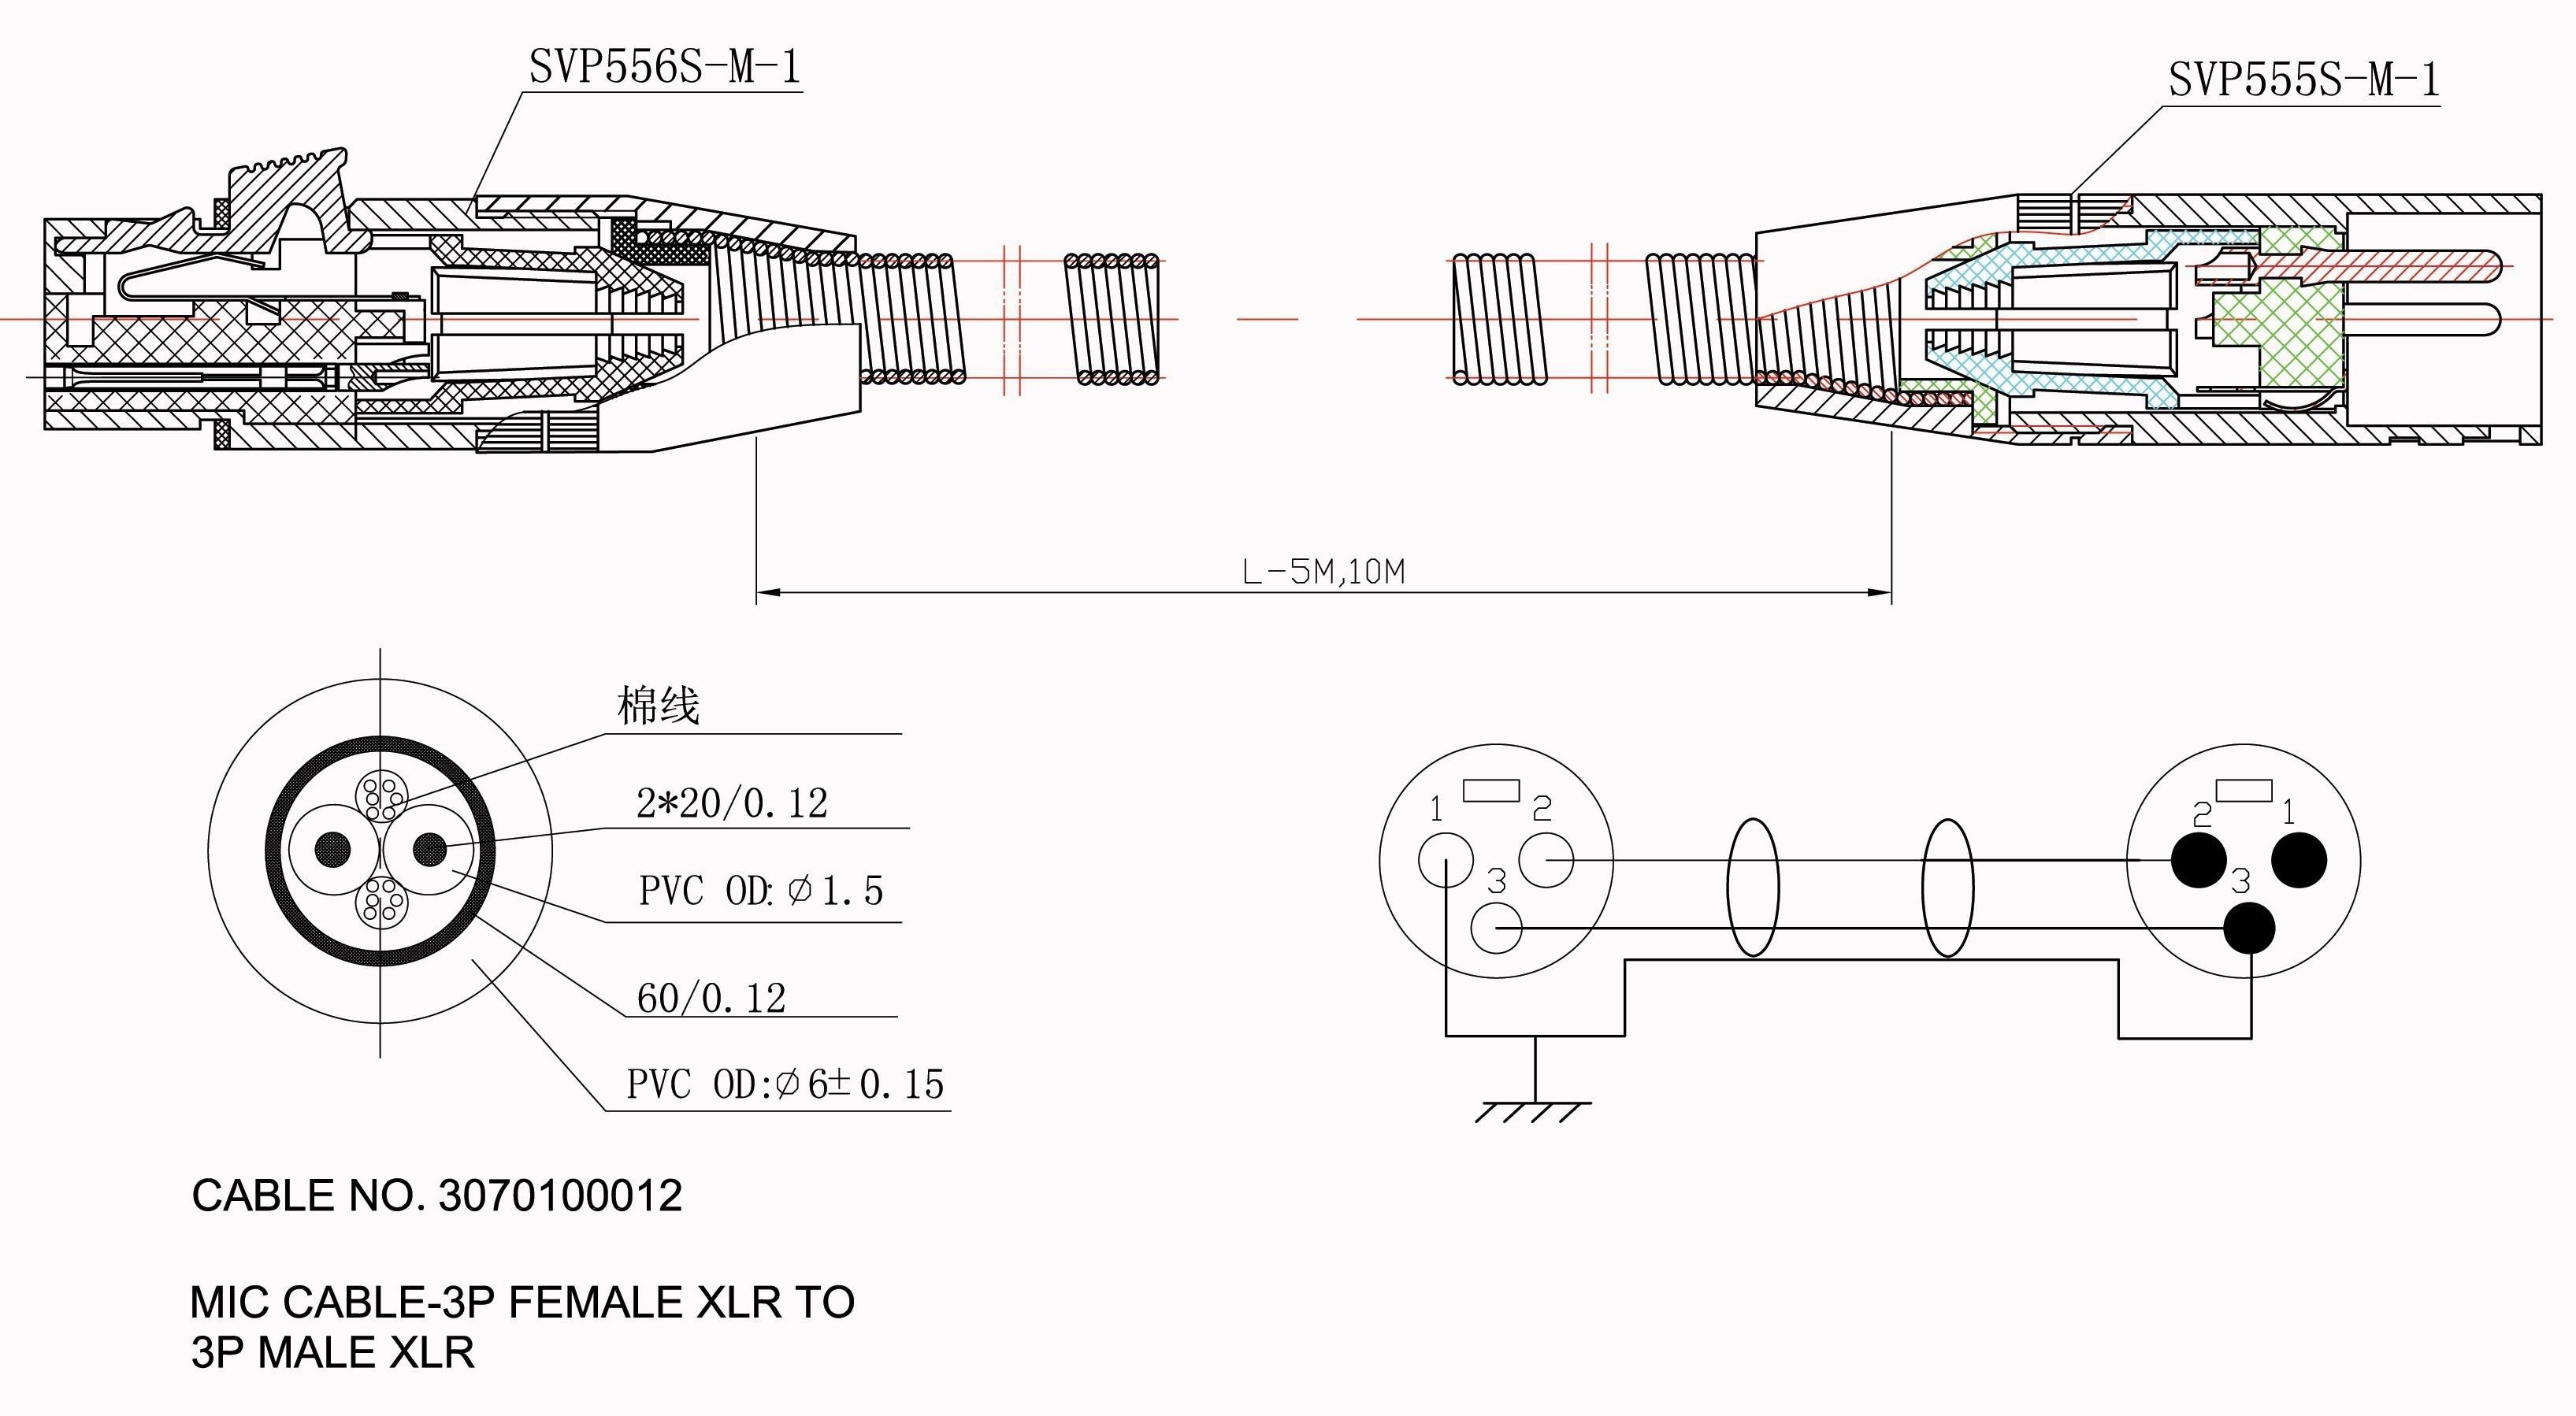 ion thruster diagram electric car engine 1999 pontiac grand am fuse